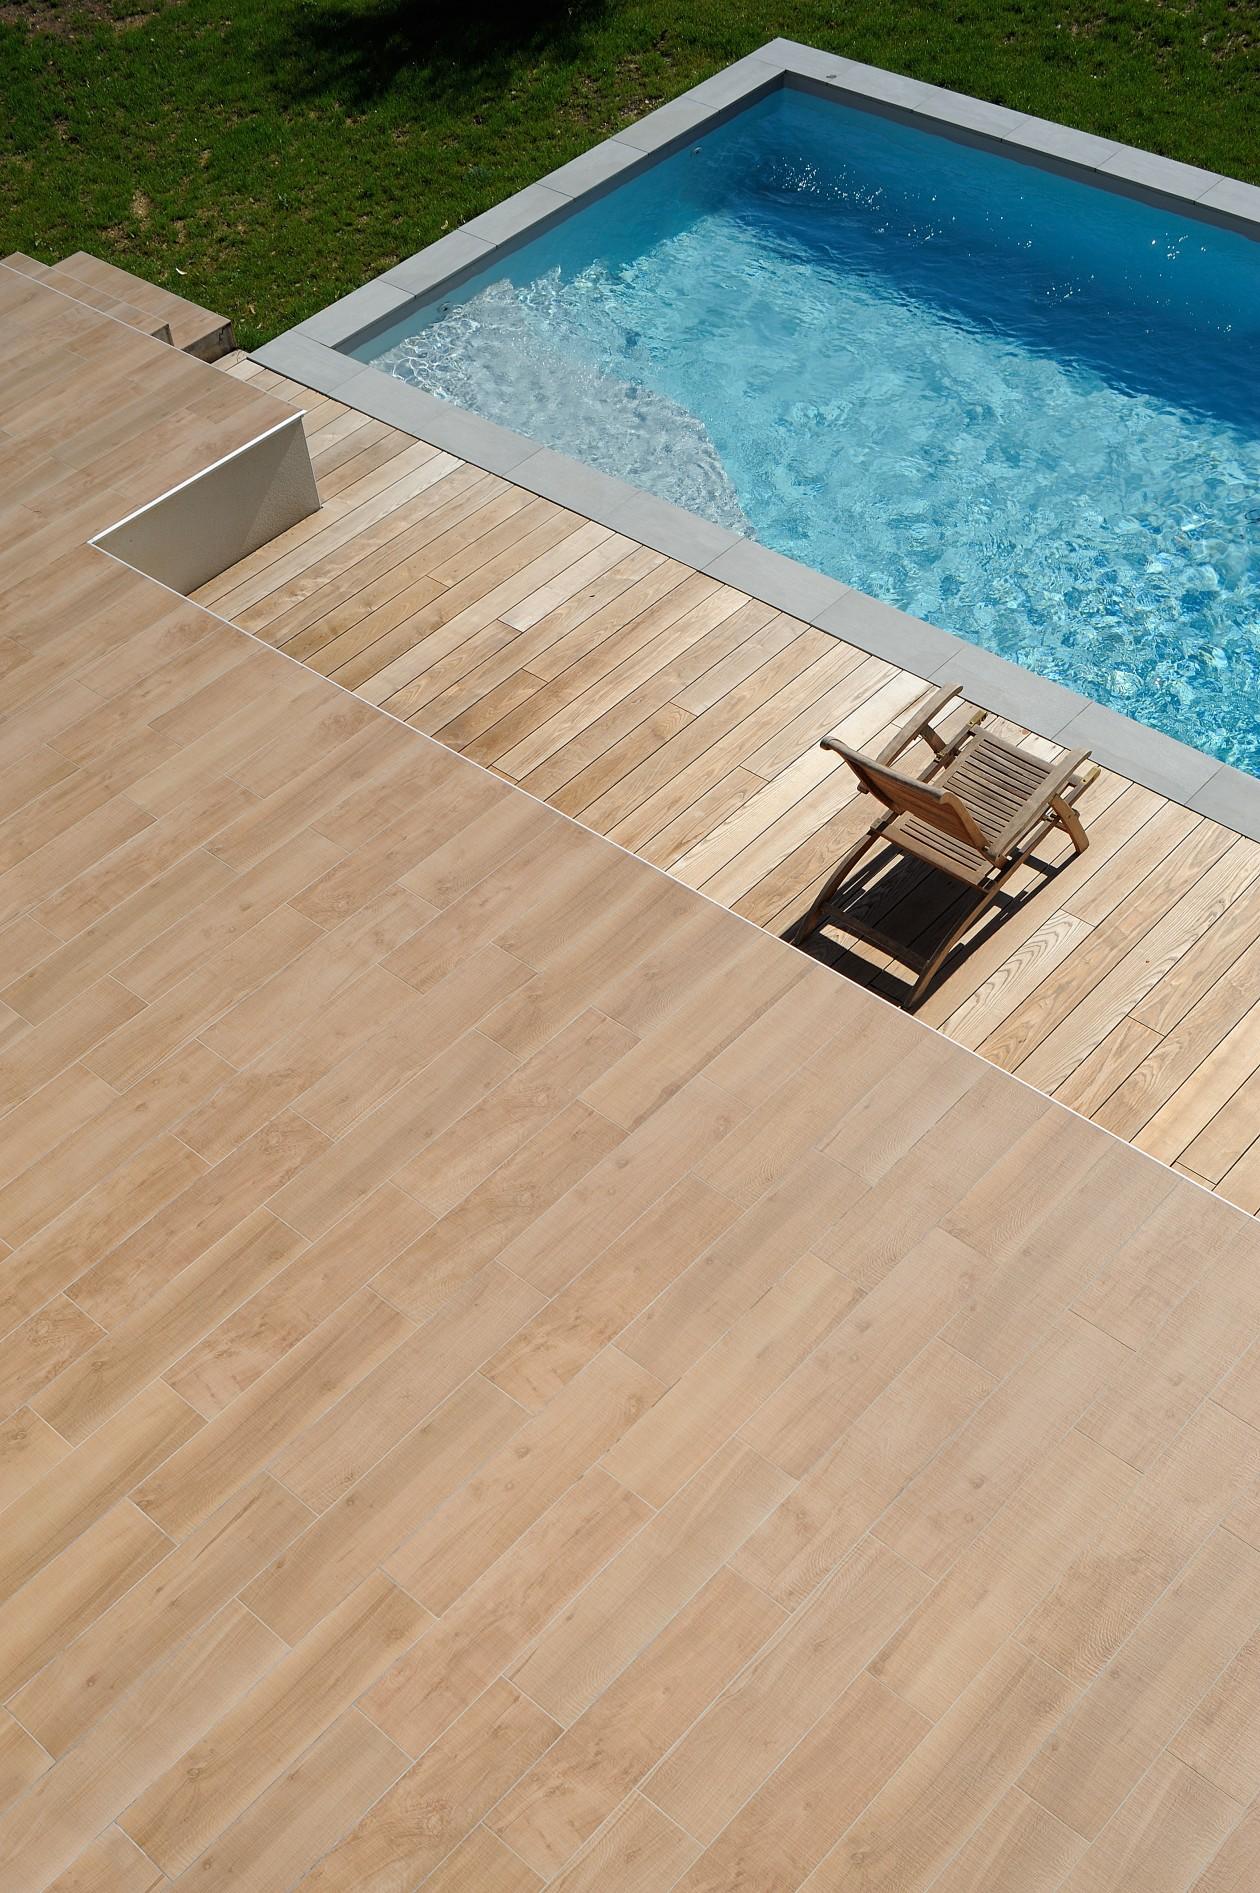 Piscine escalier d 39 angle neyron piscines concept for Piscines concept